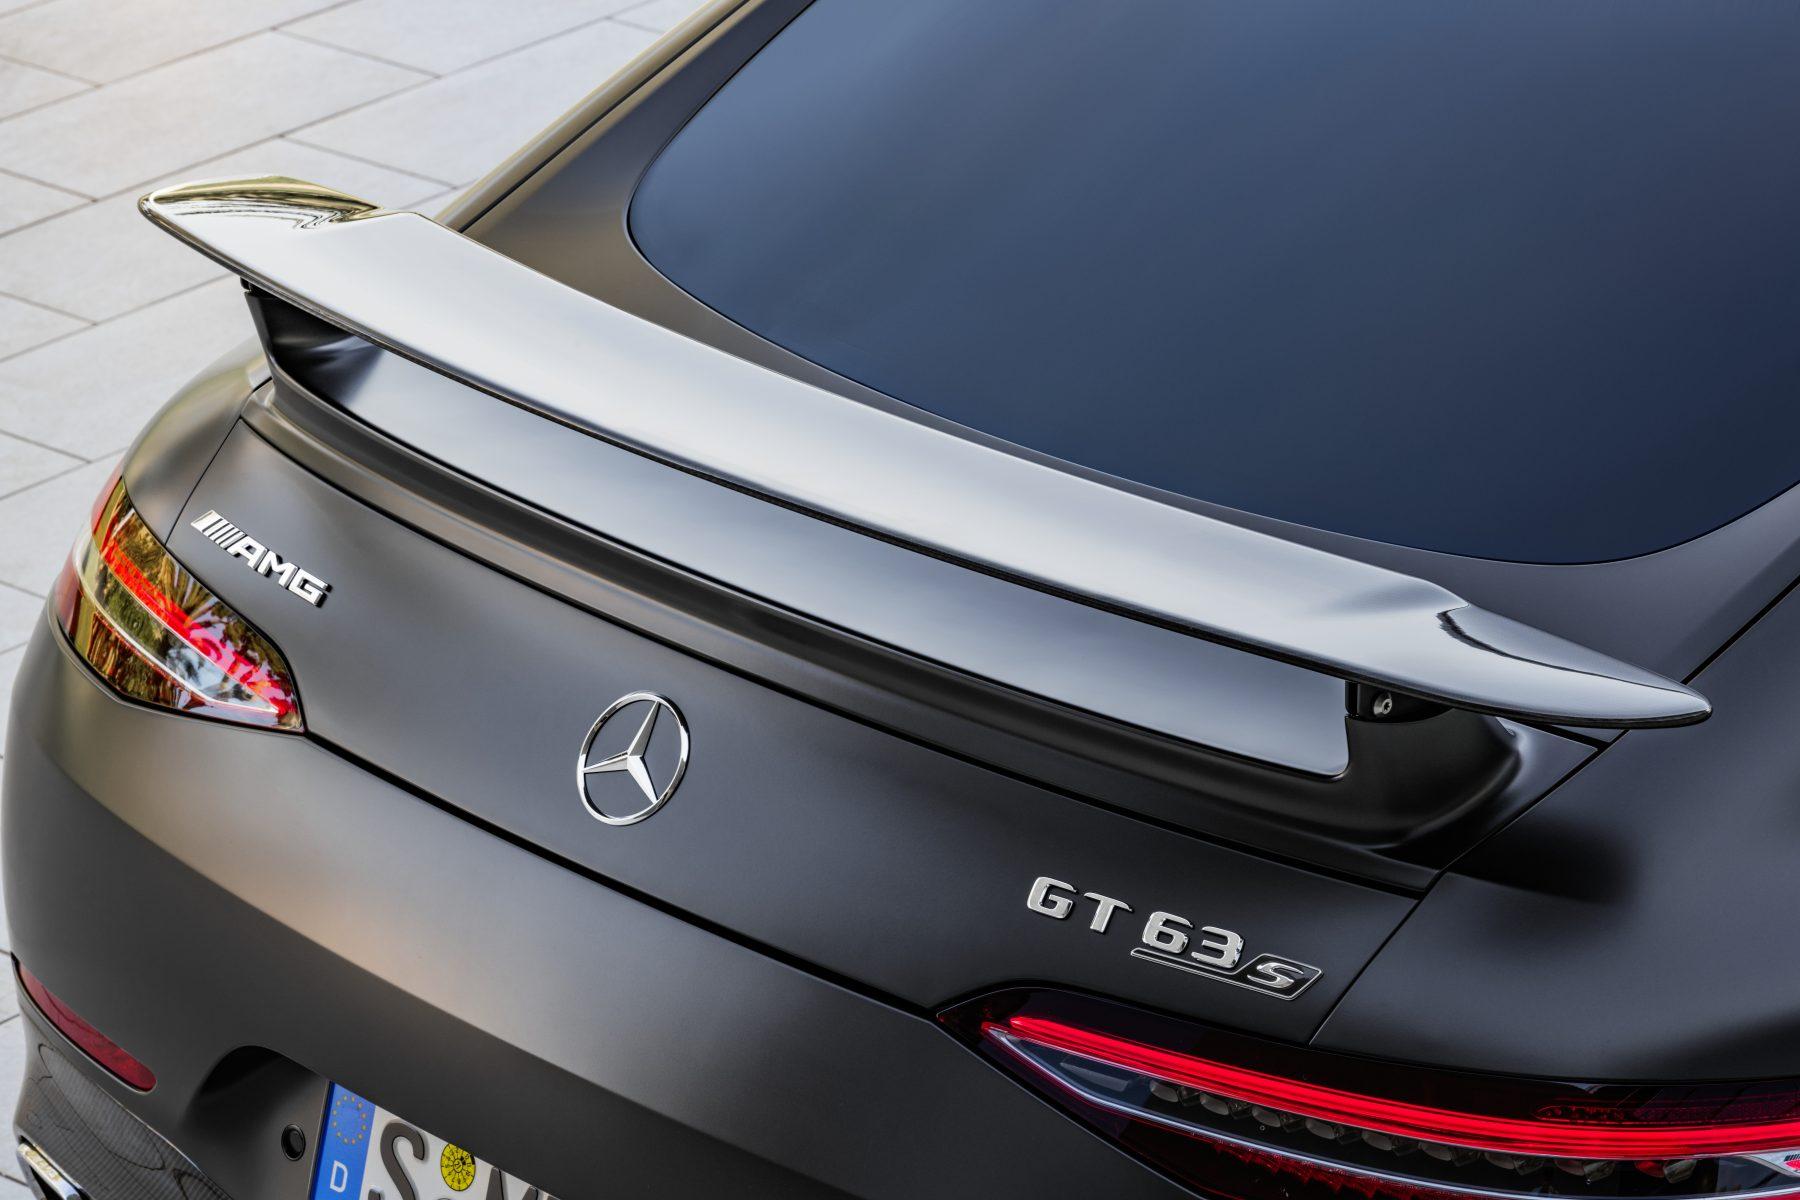 Mercedes-AMG GT 63 S 4MATIC+ 4-Türer CoupéMercedes-AMG GT 63 S 4MATIC+ 4-Door Coupé